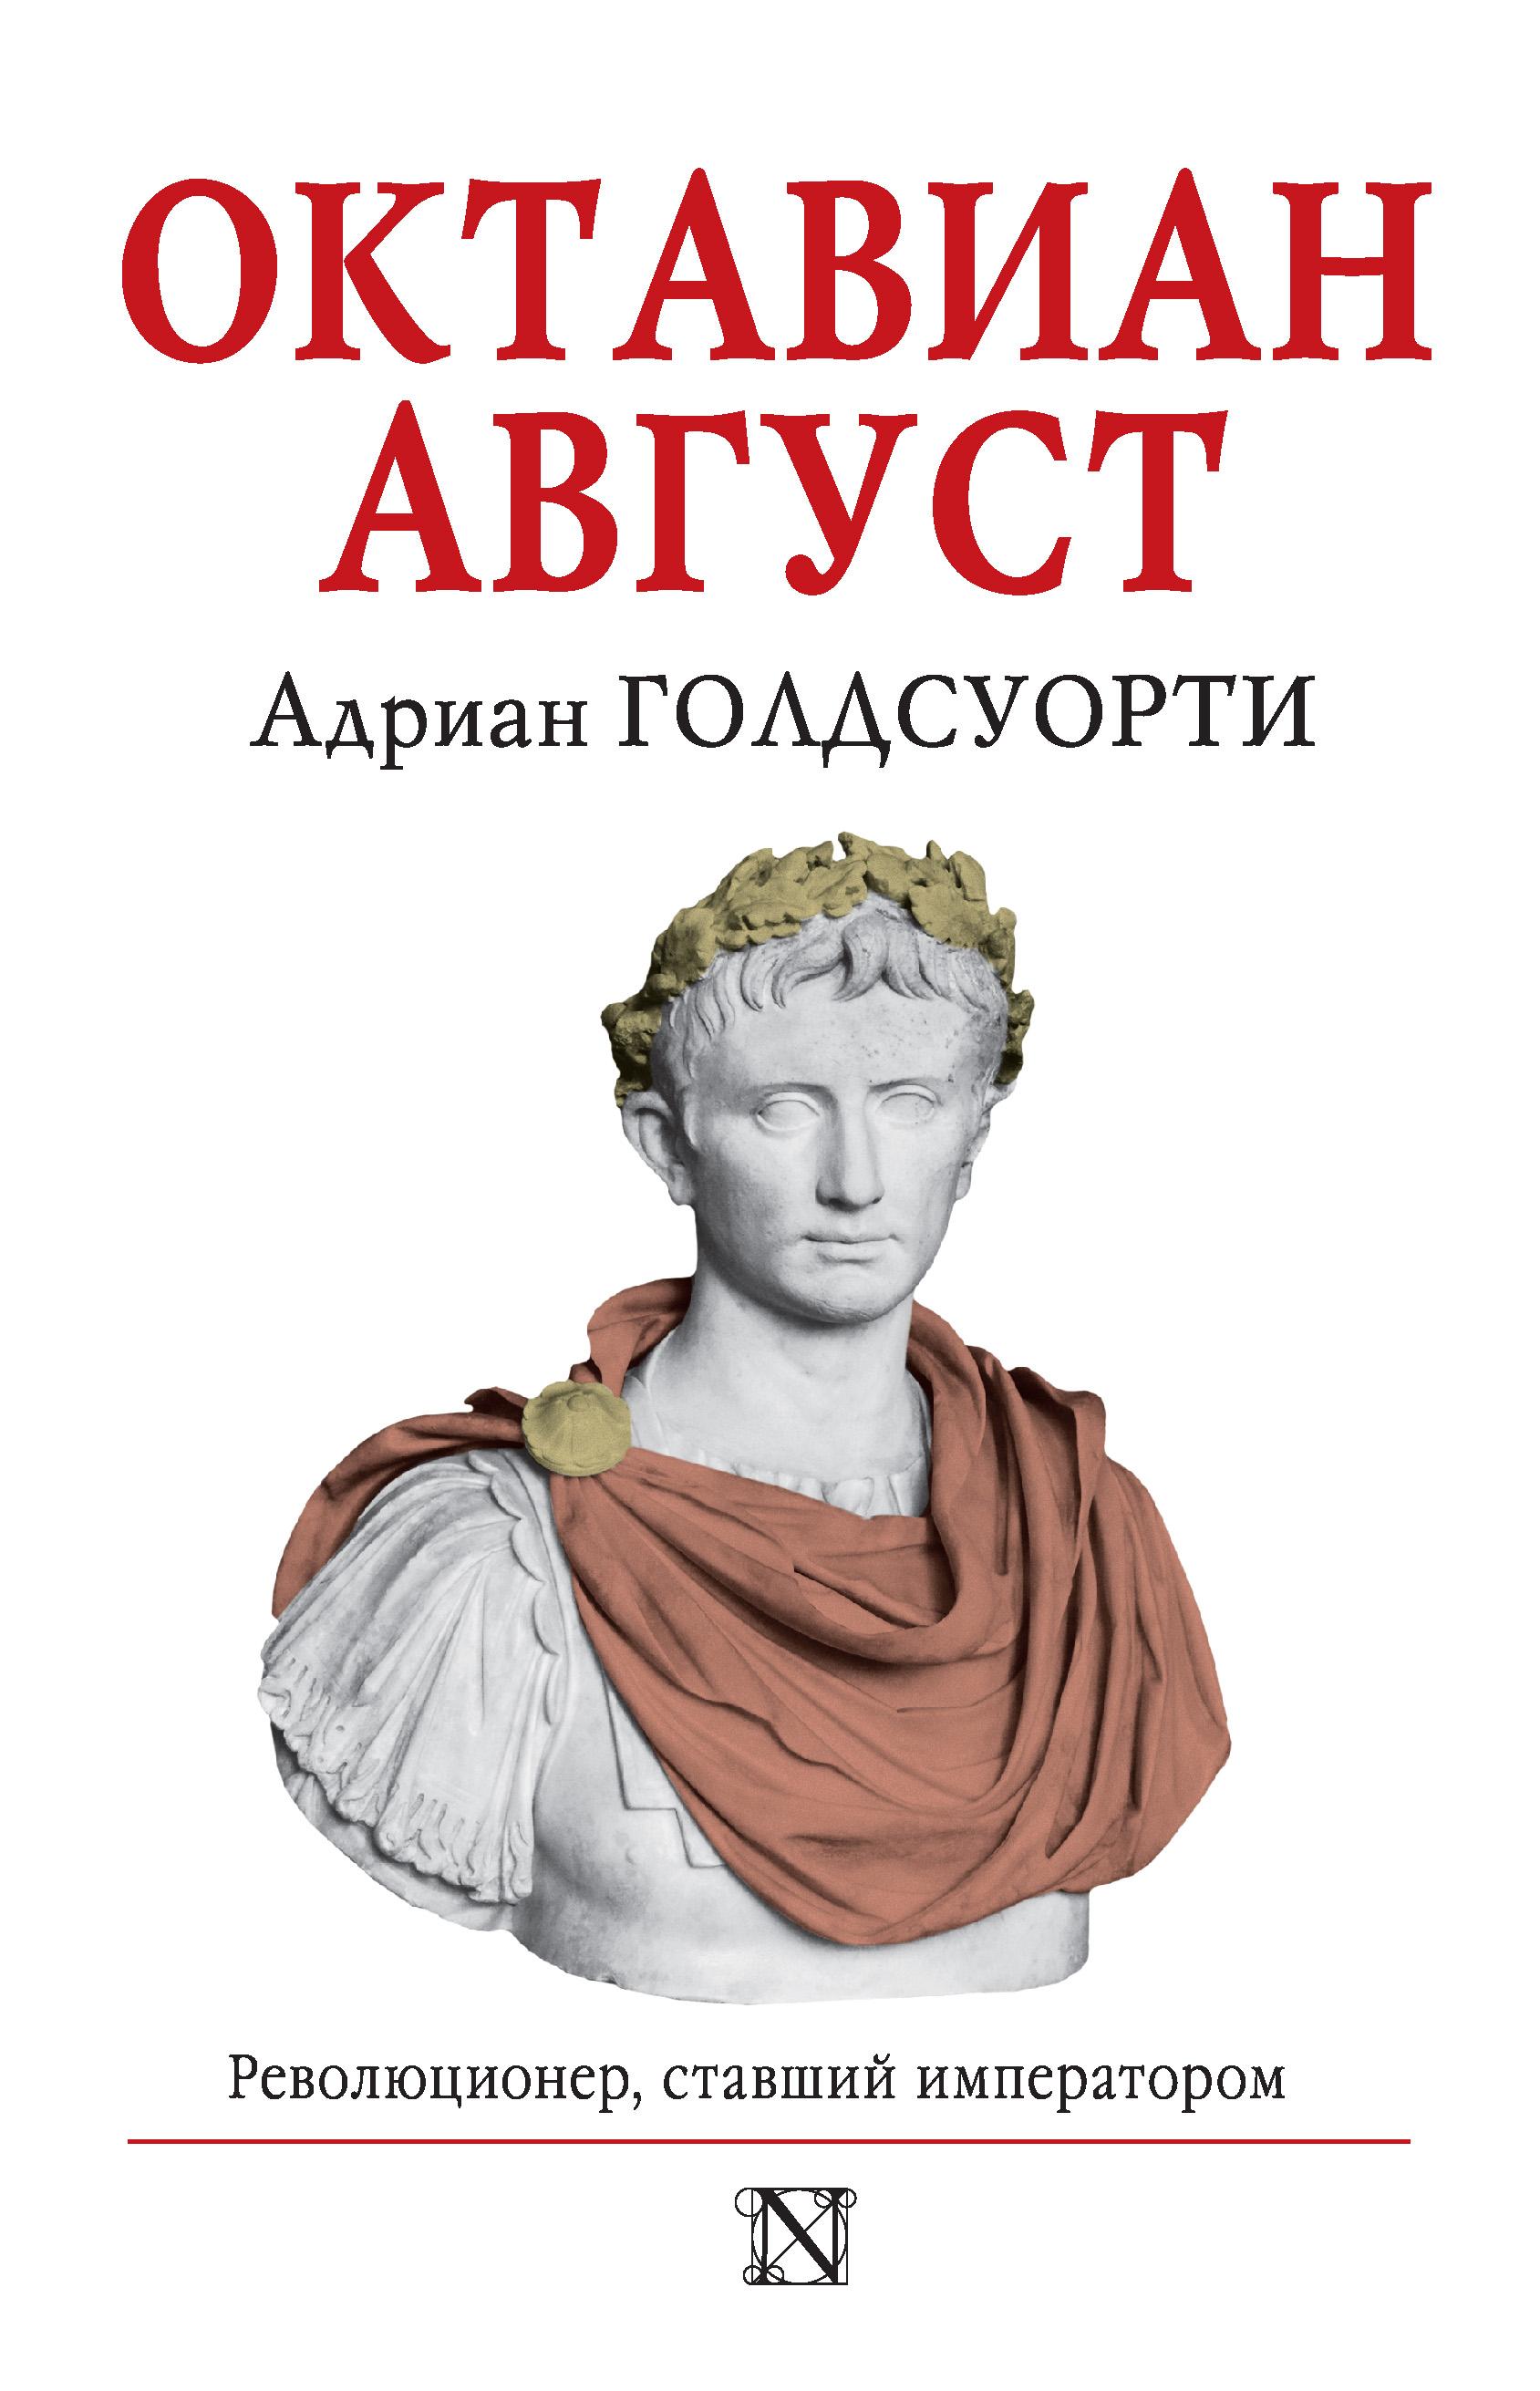 Адриан Голдсуорти Октавиан Август. Революционер, ставший императором август октавиан